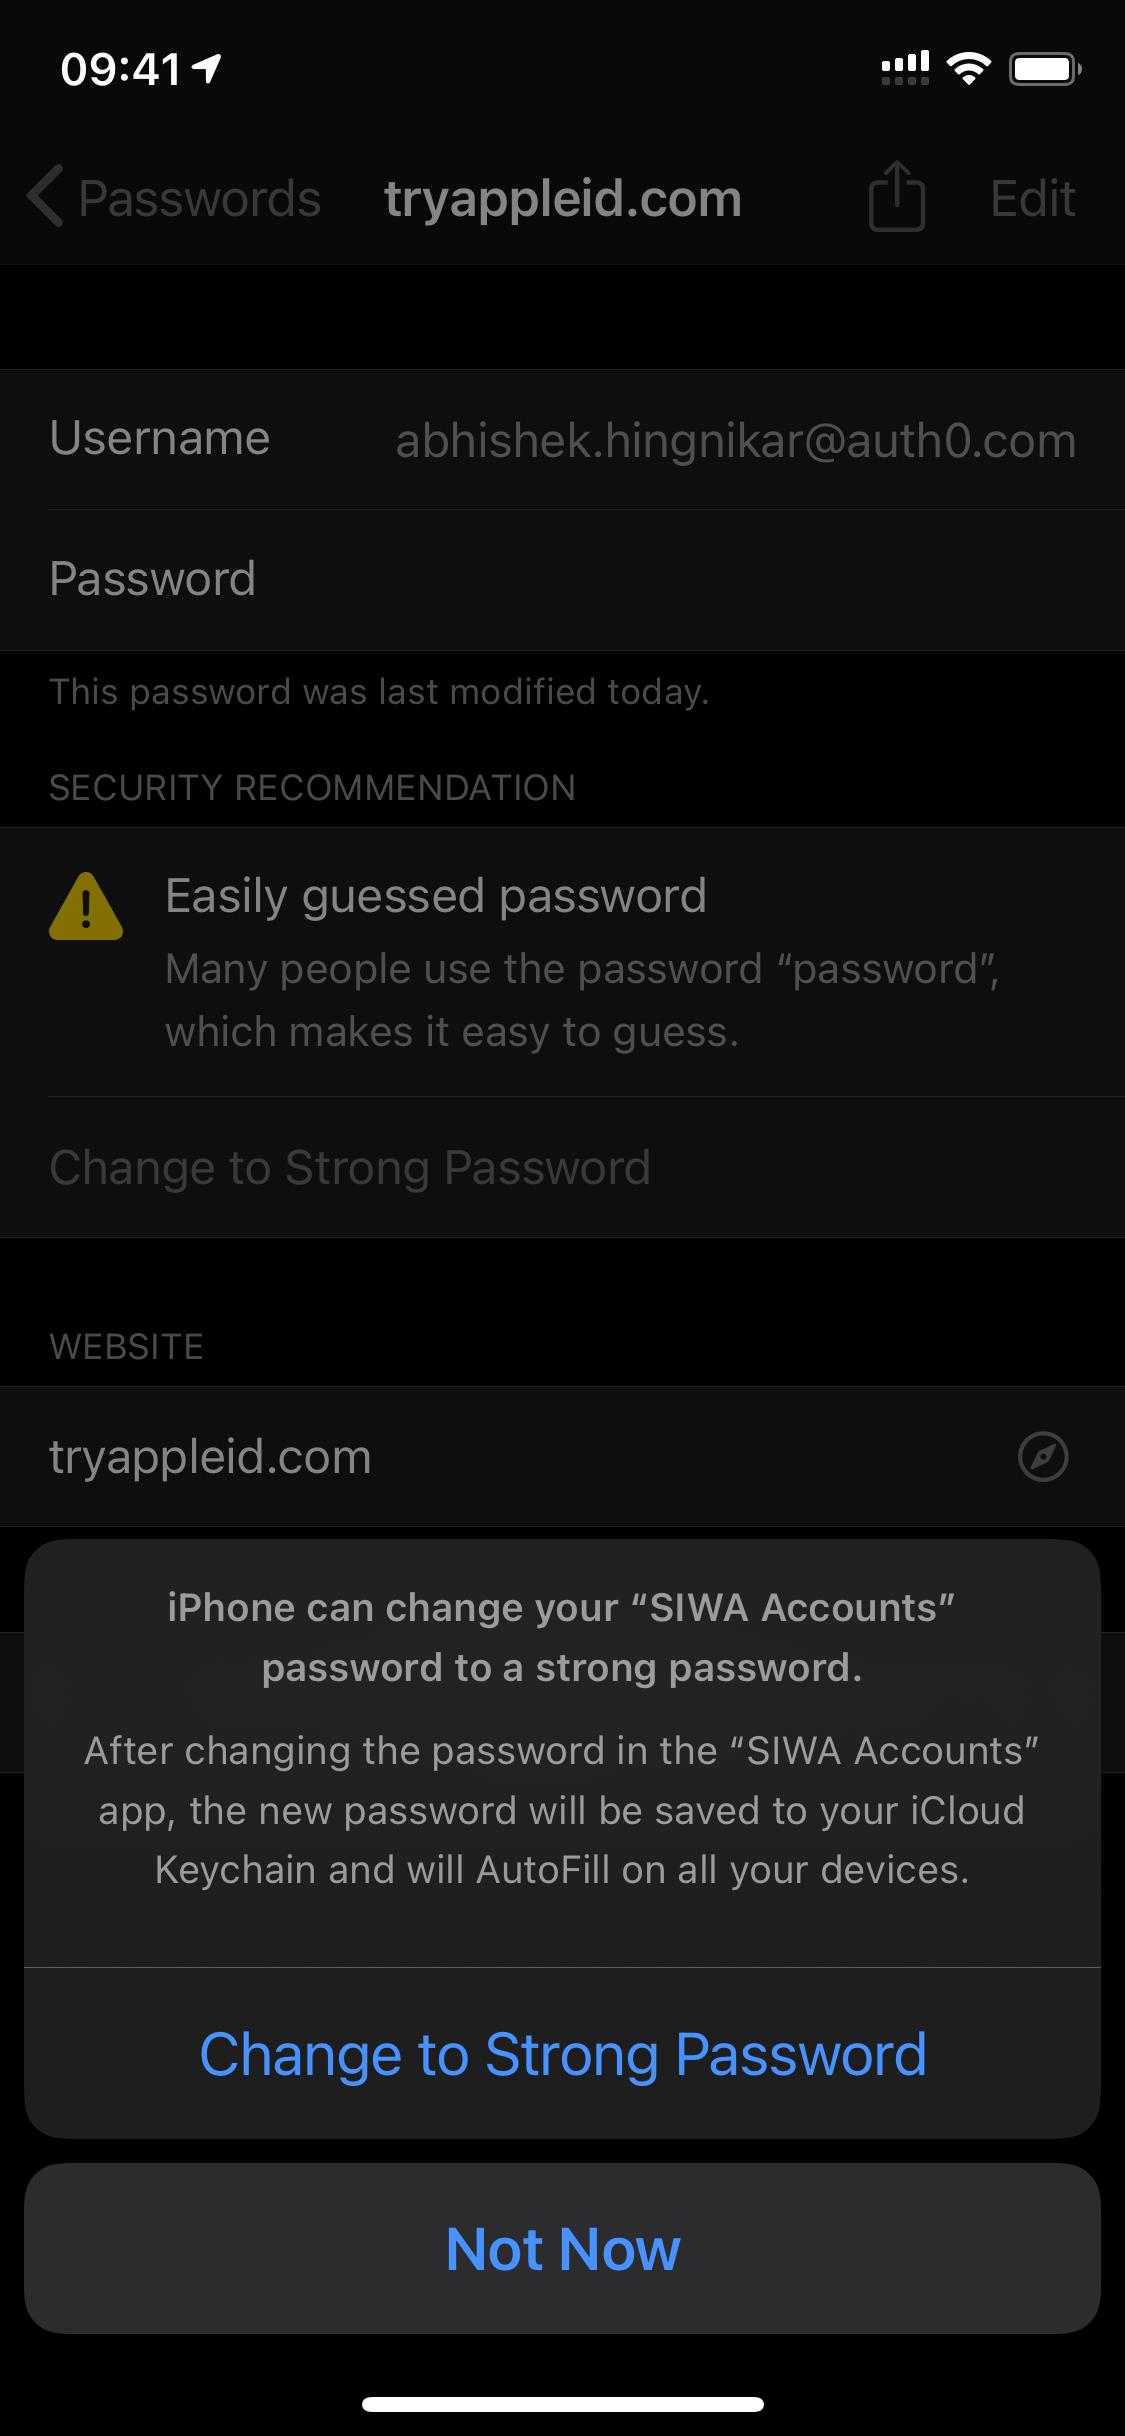 Apple Keychain password upgrade confirmation